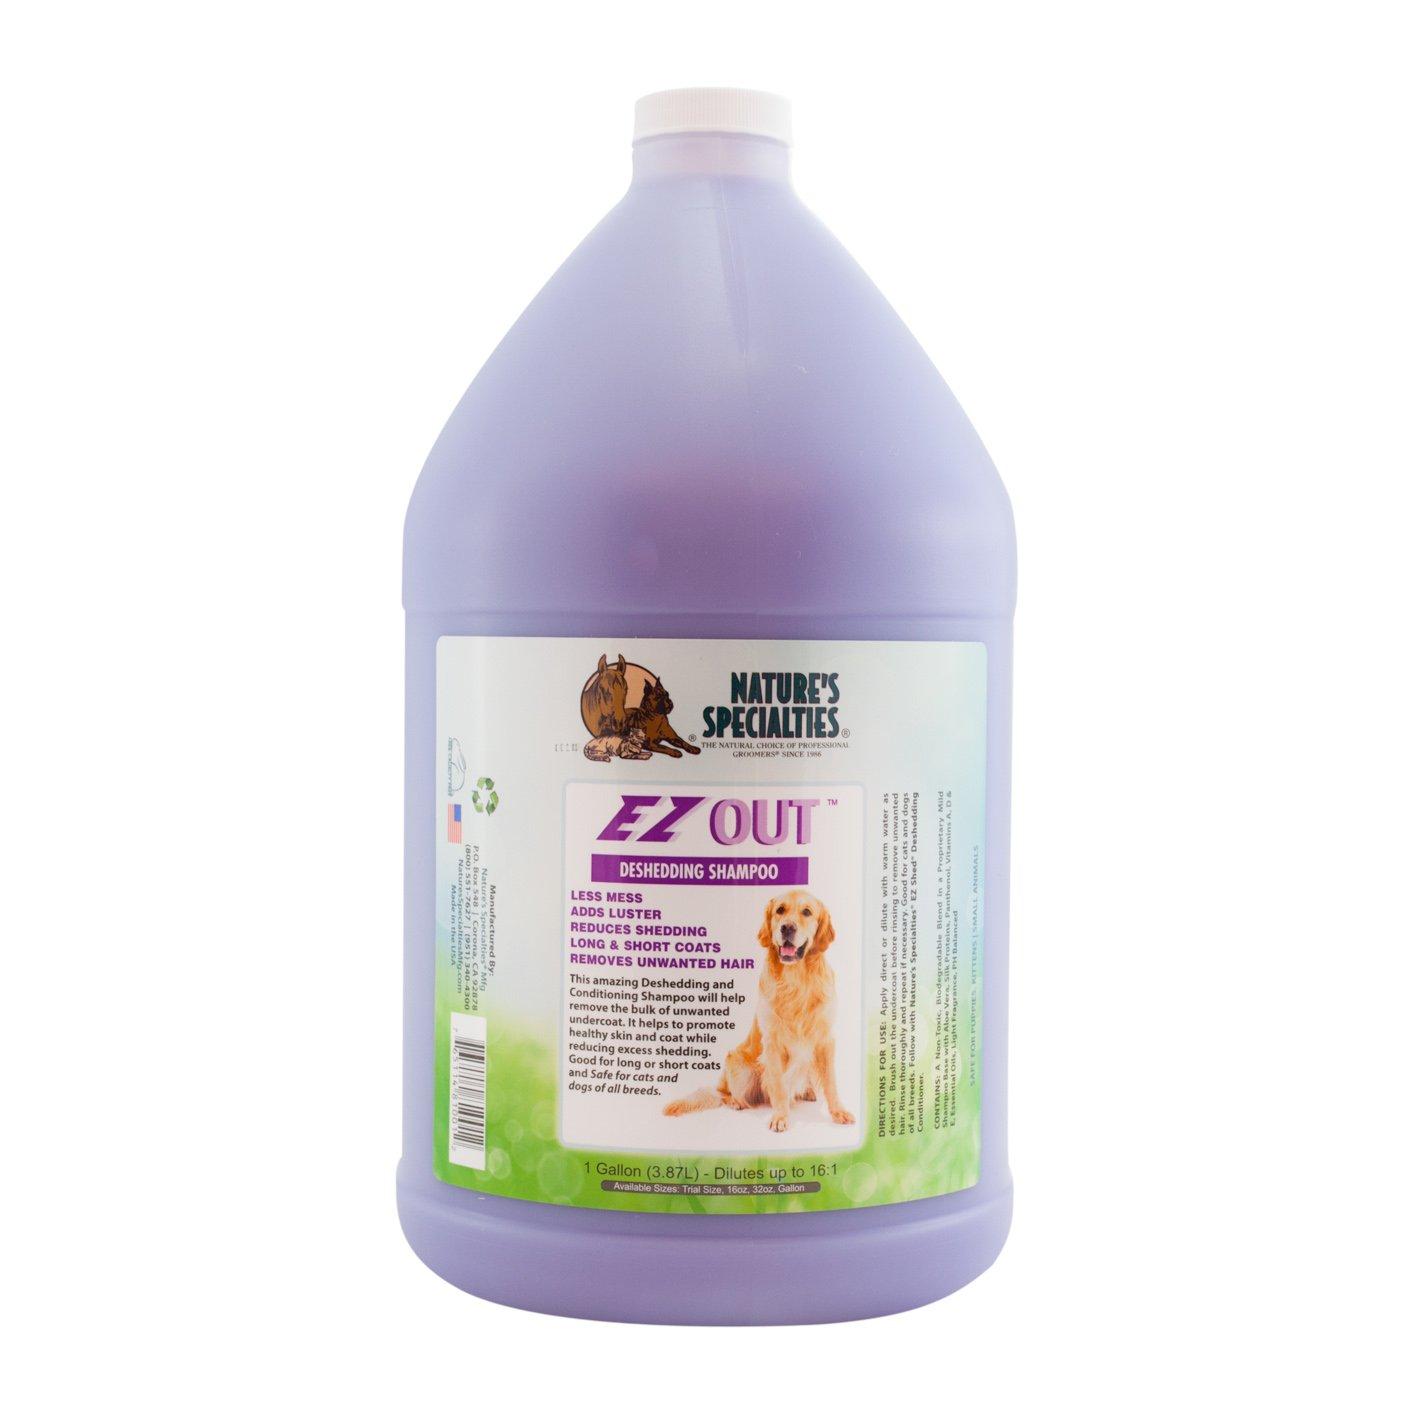 Nature's Specialties EZ Out Detangling Pet Shampoo